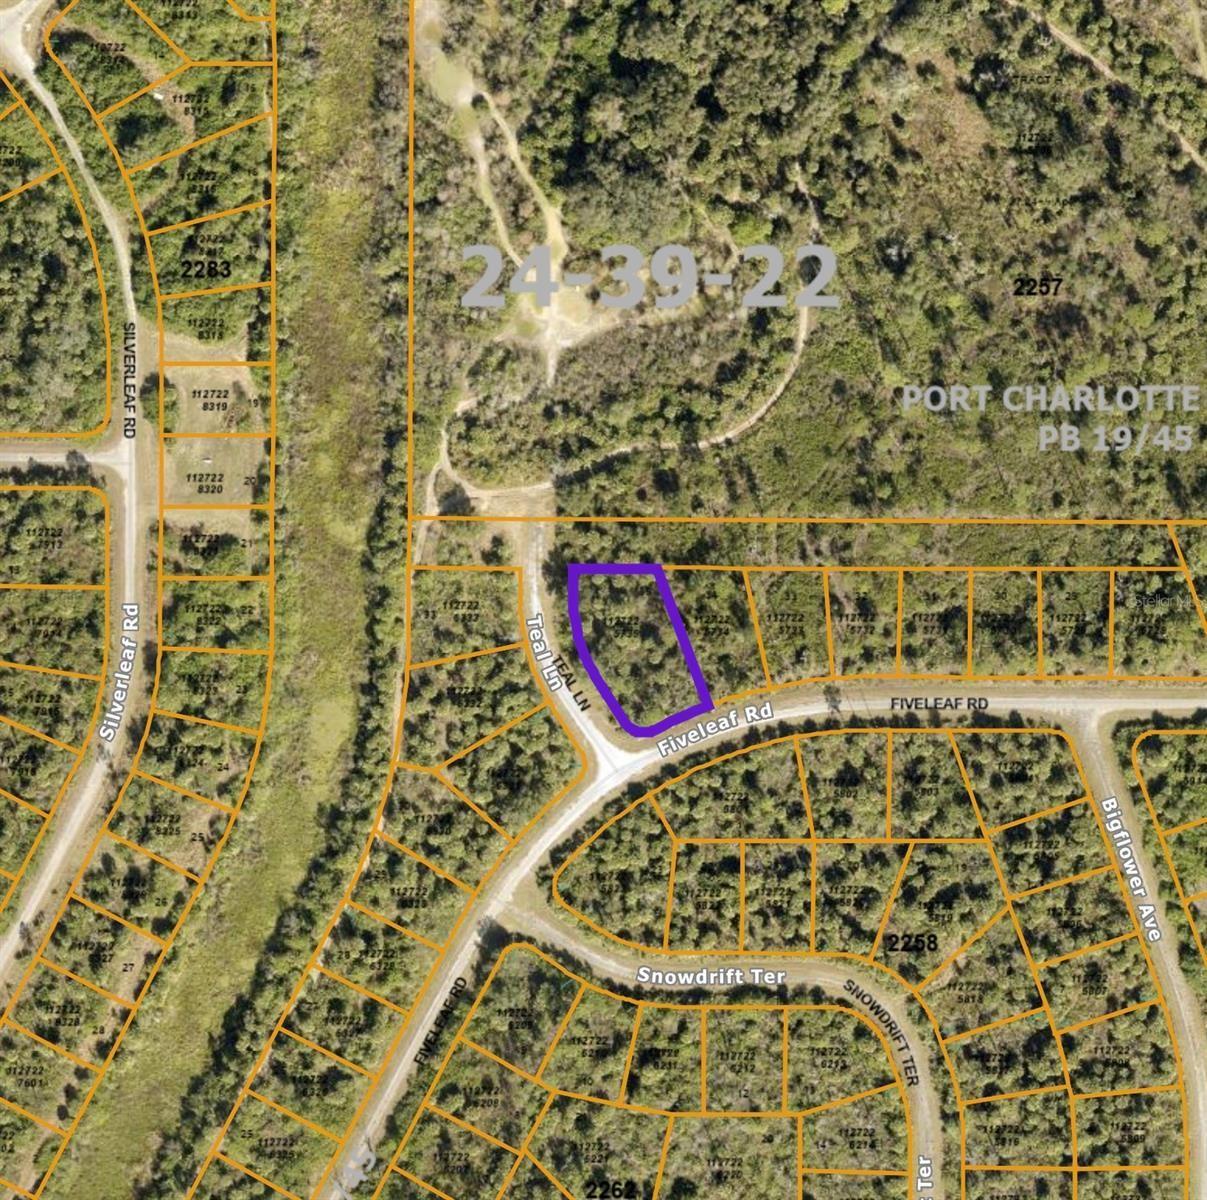 Photo of Lot 35 FIVELEAF ROAD, NORTH PORT, FL 34288 (MLS # A4512886)